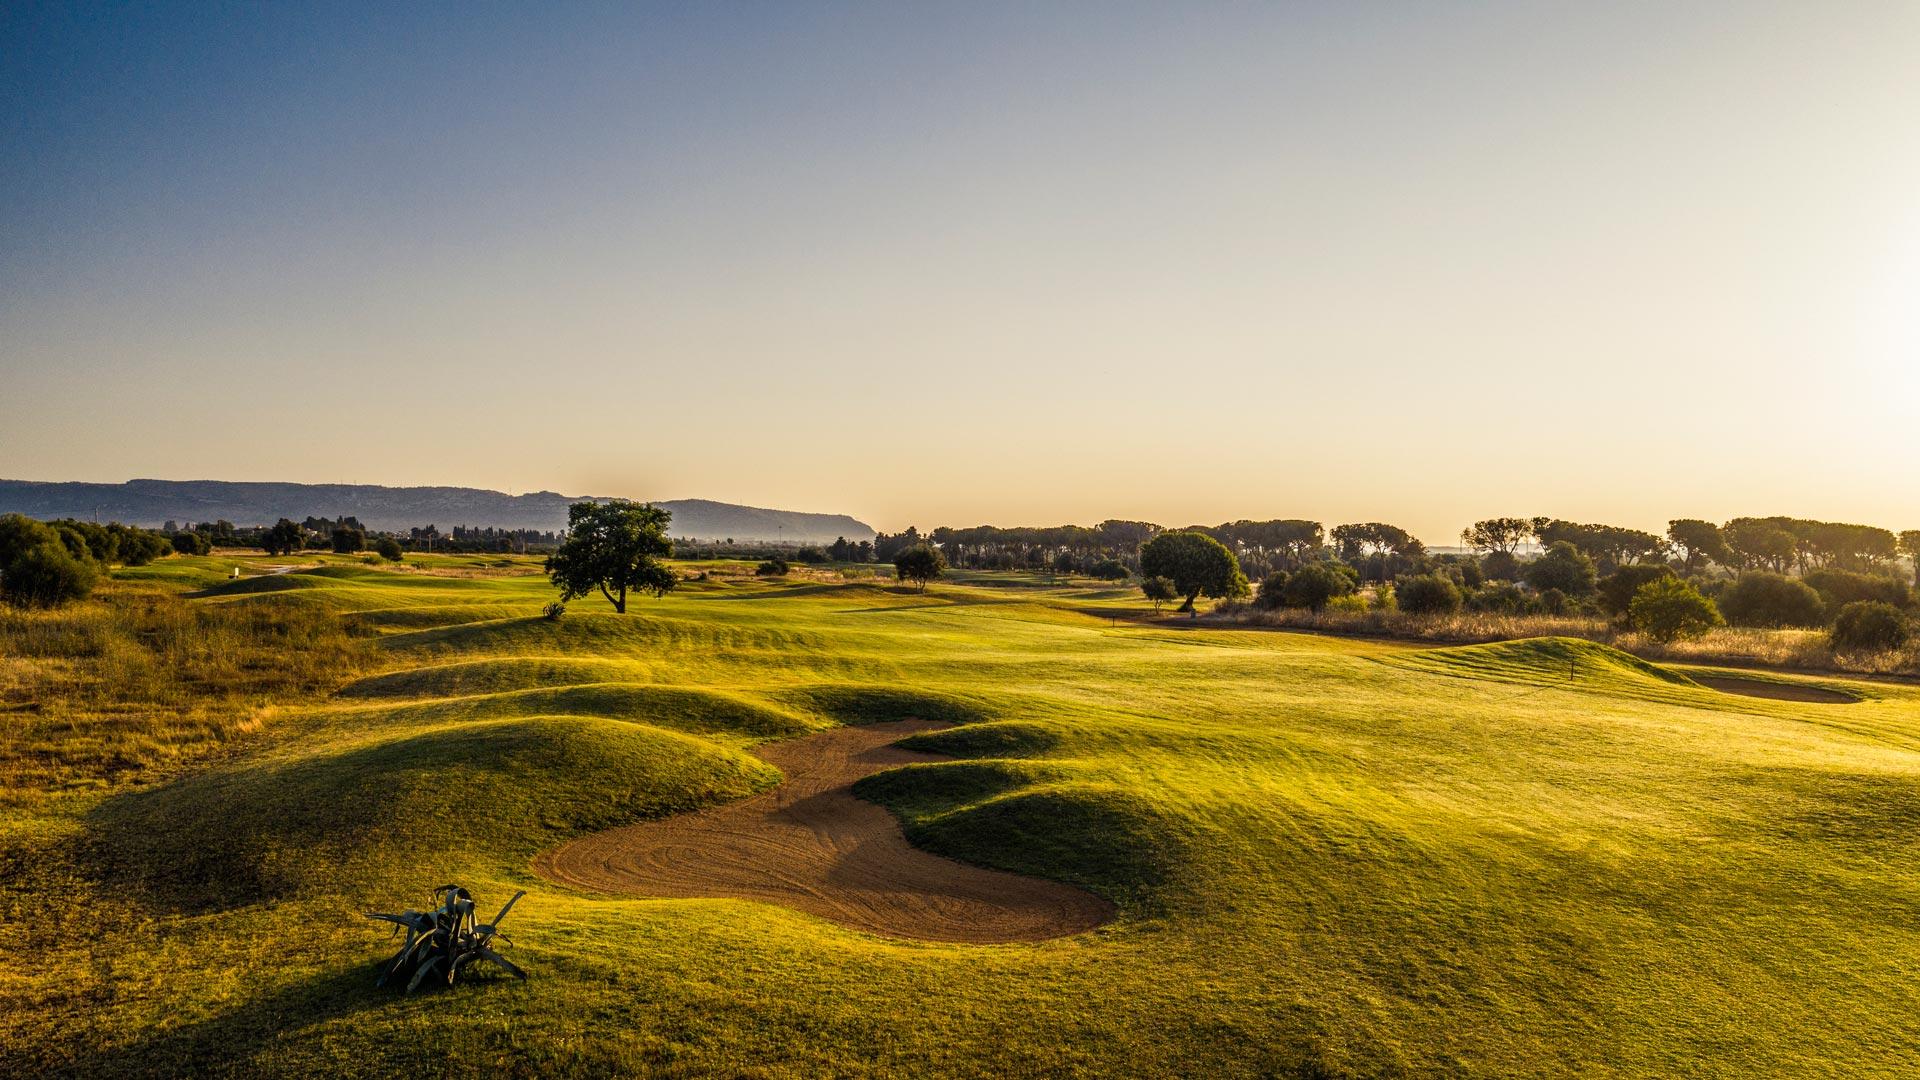 borgo-di-luce-i-monasteri-golf-course